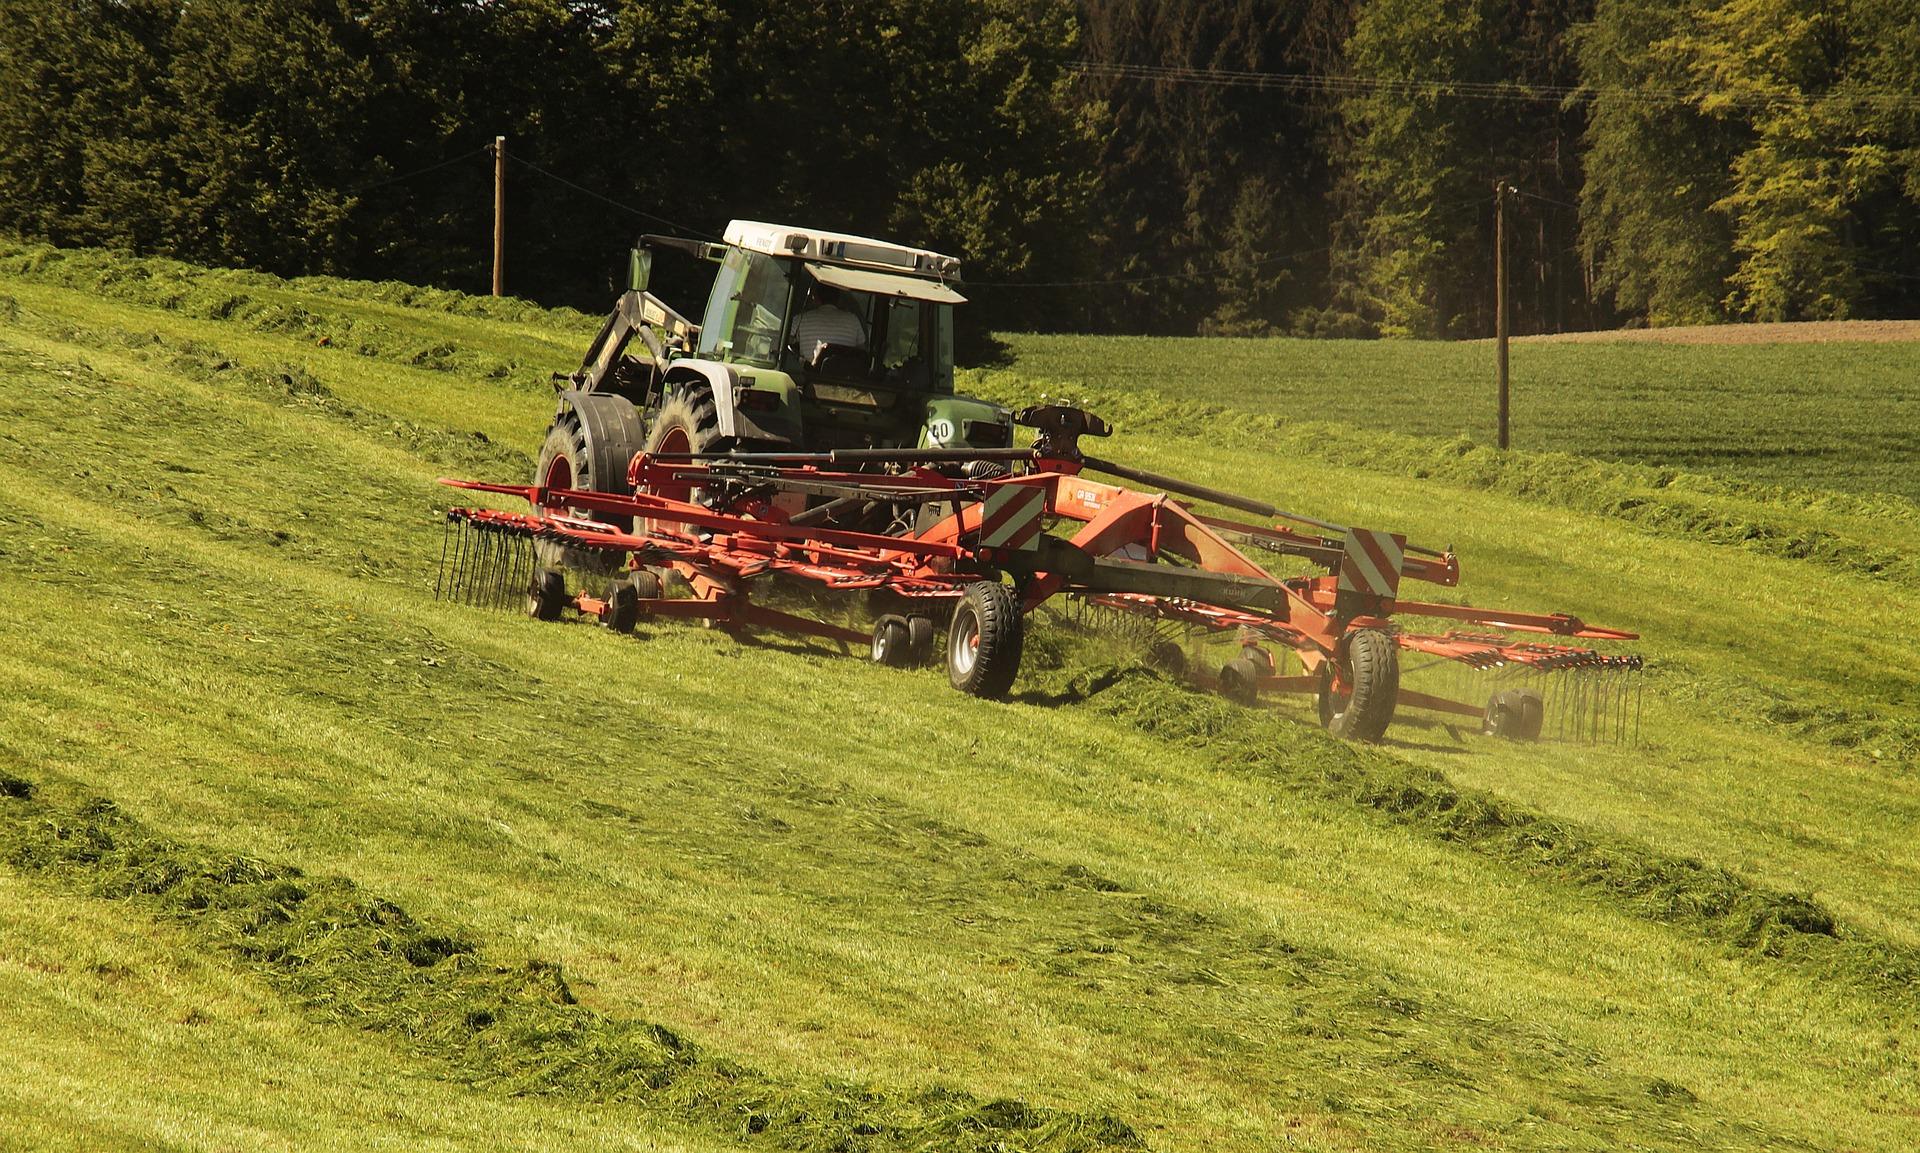 tractor-3382681_1920.jpg